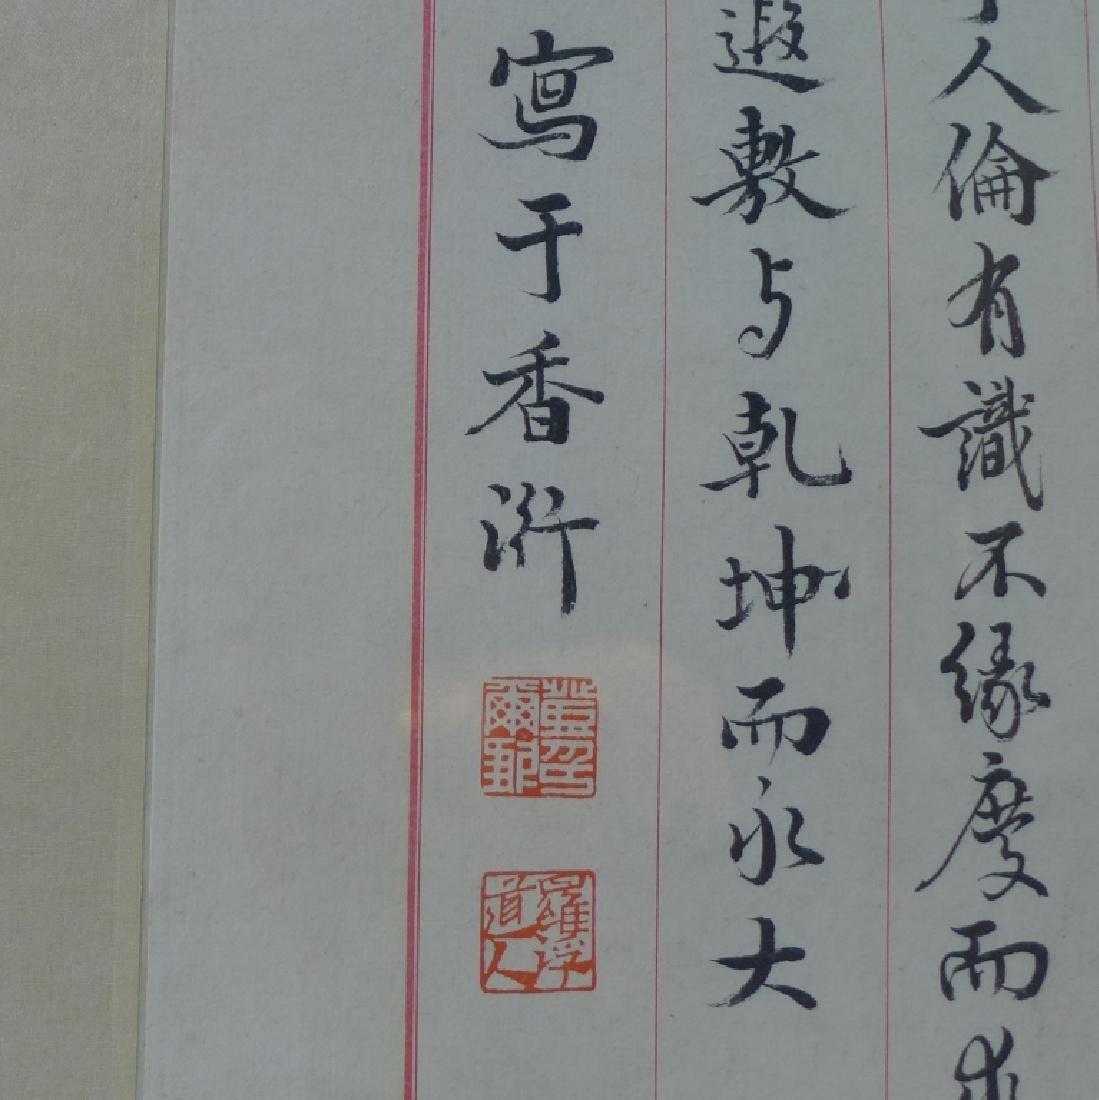 Framed Chinese Calligraphy Art - 4